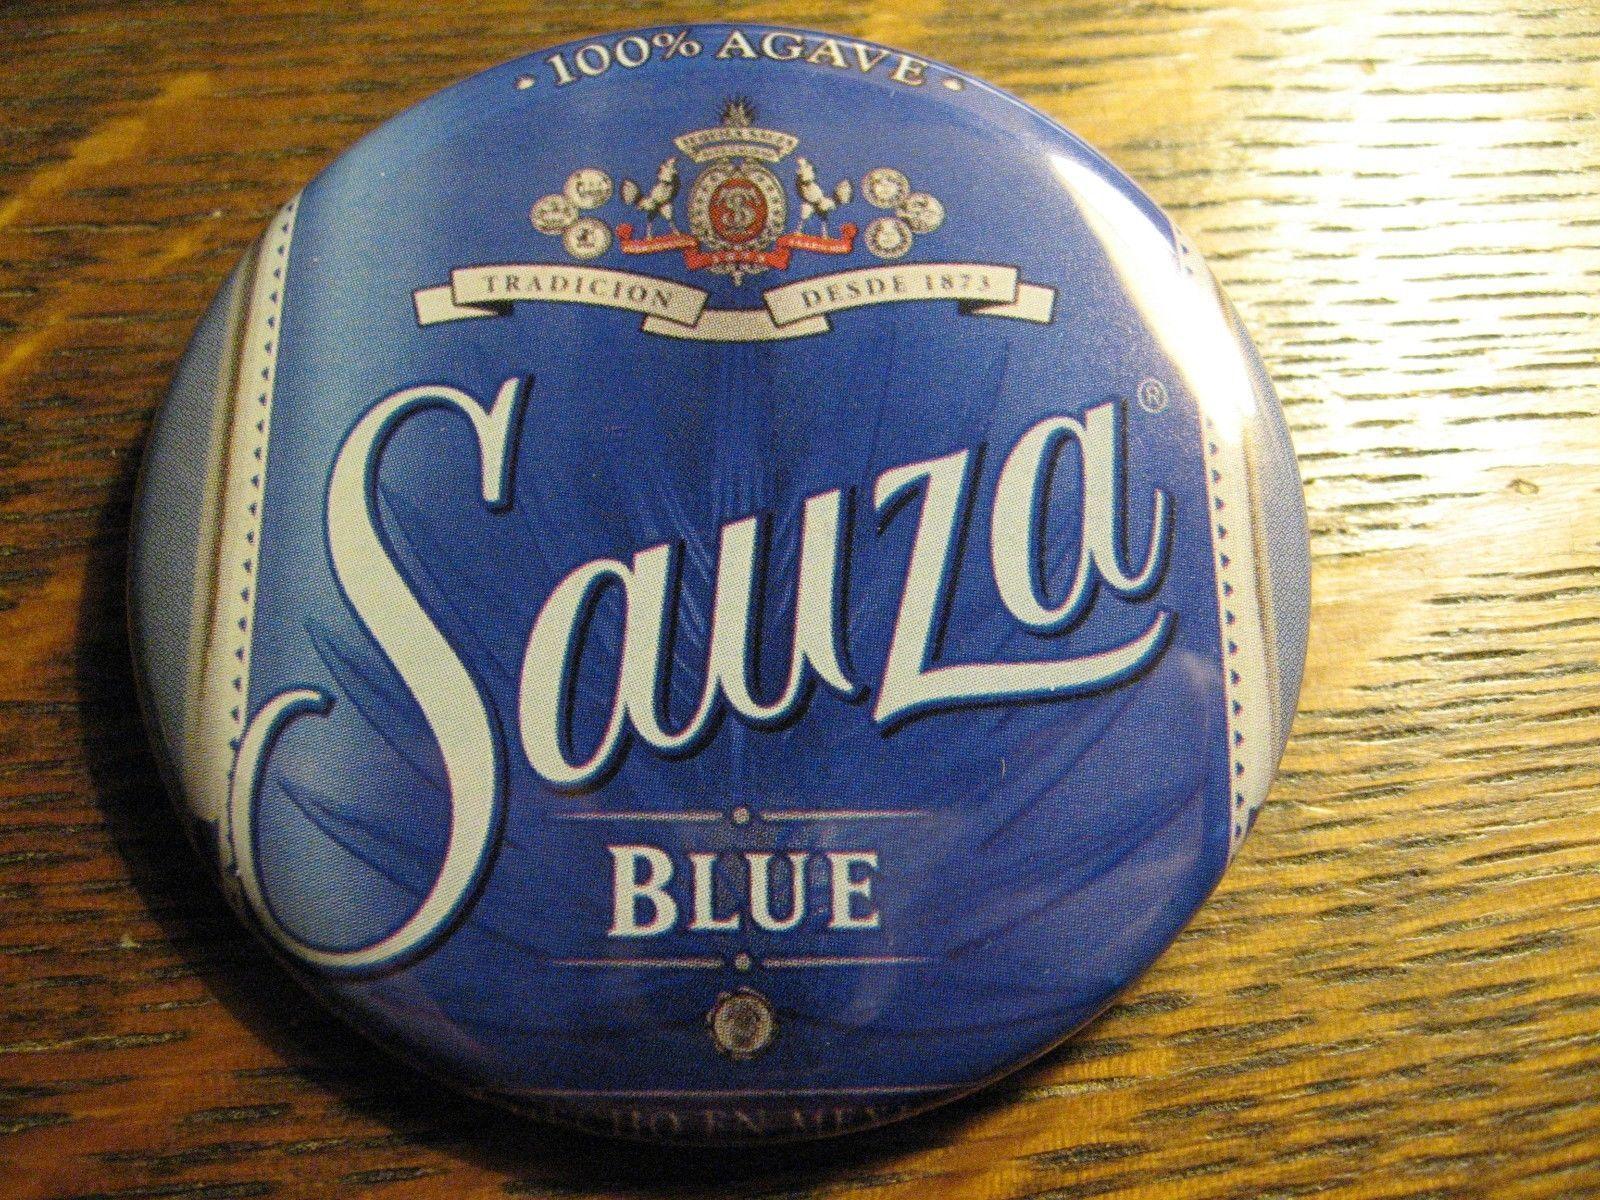 Sauza Blue Agave Tequila Mexico Logo Bottle Label Advertisement Lapel Button Pin